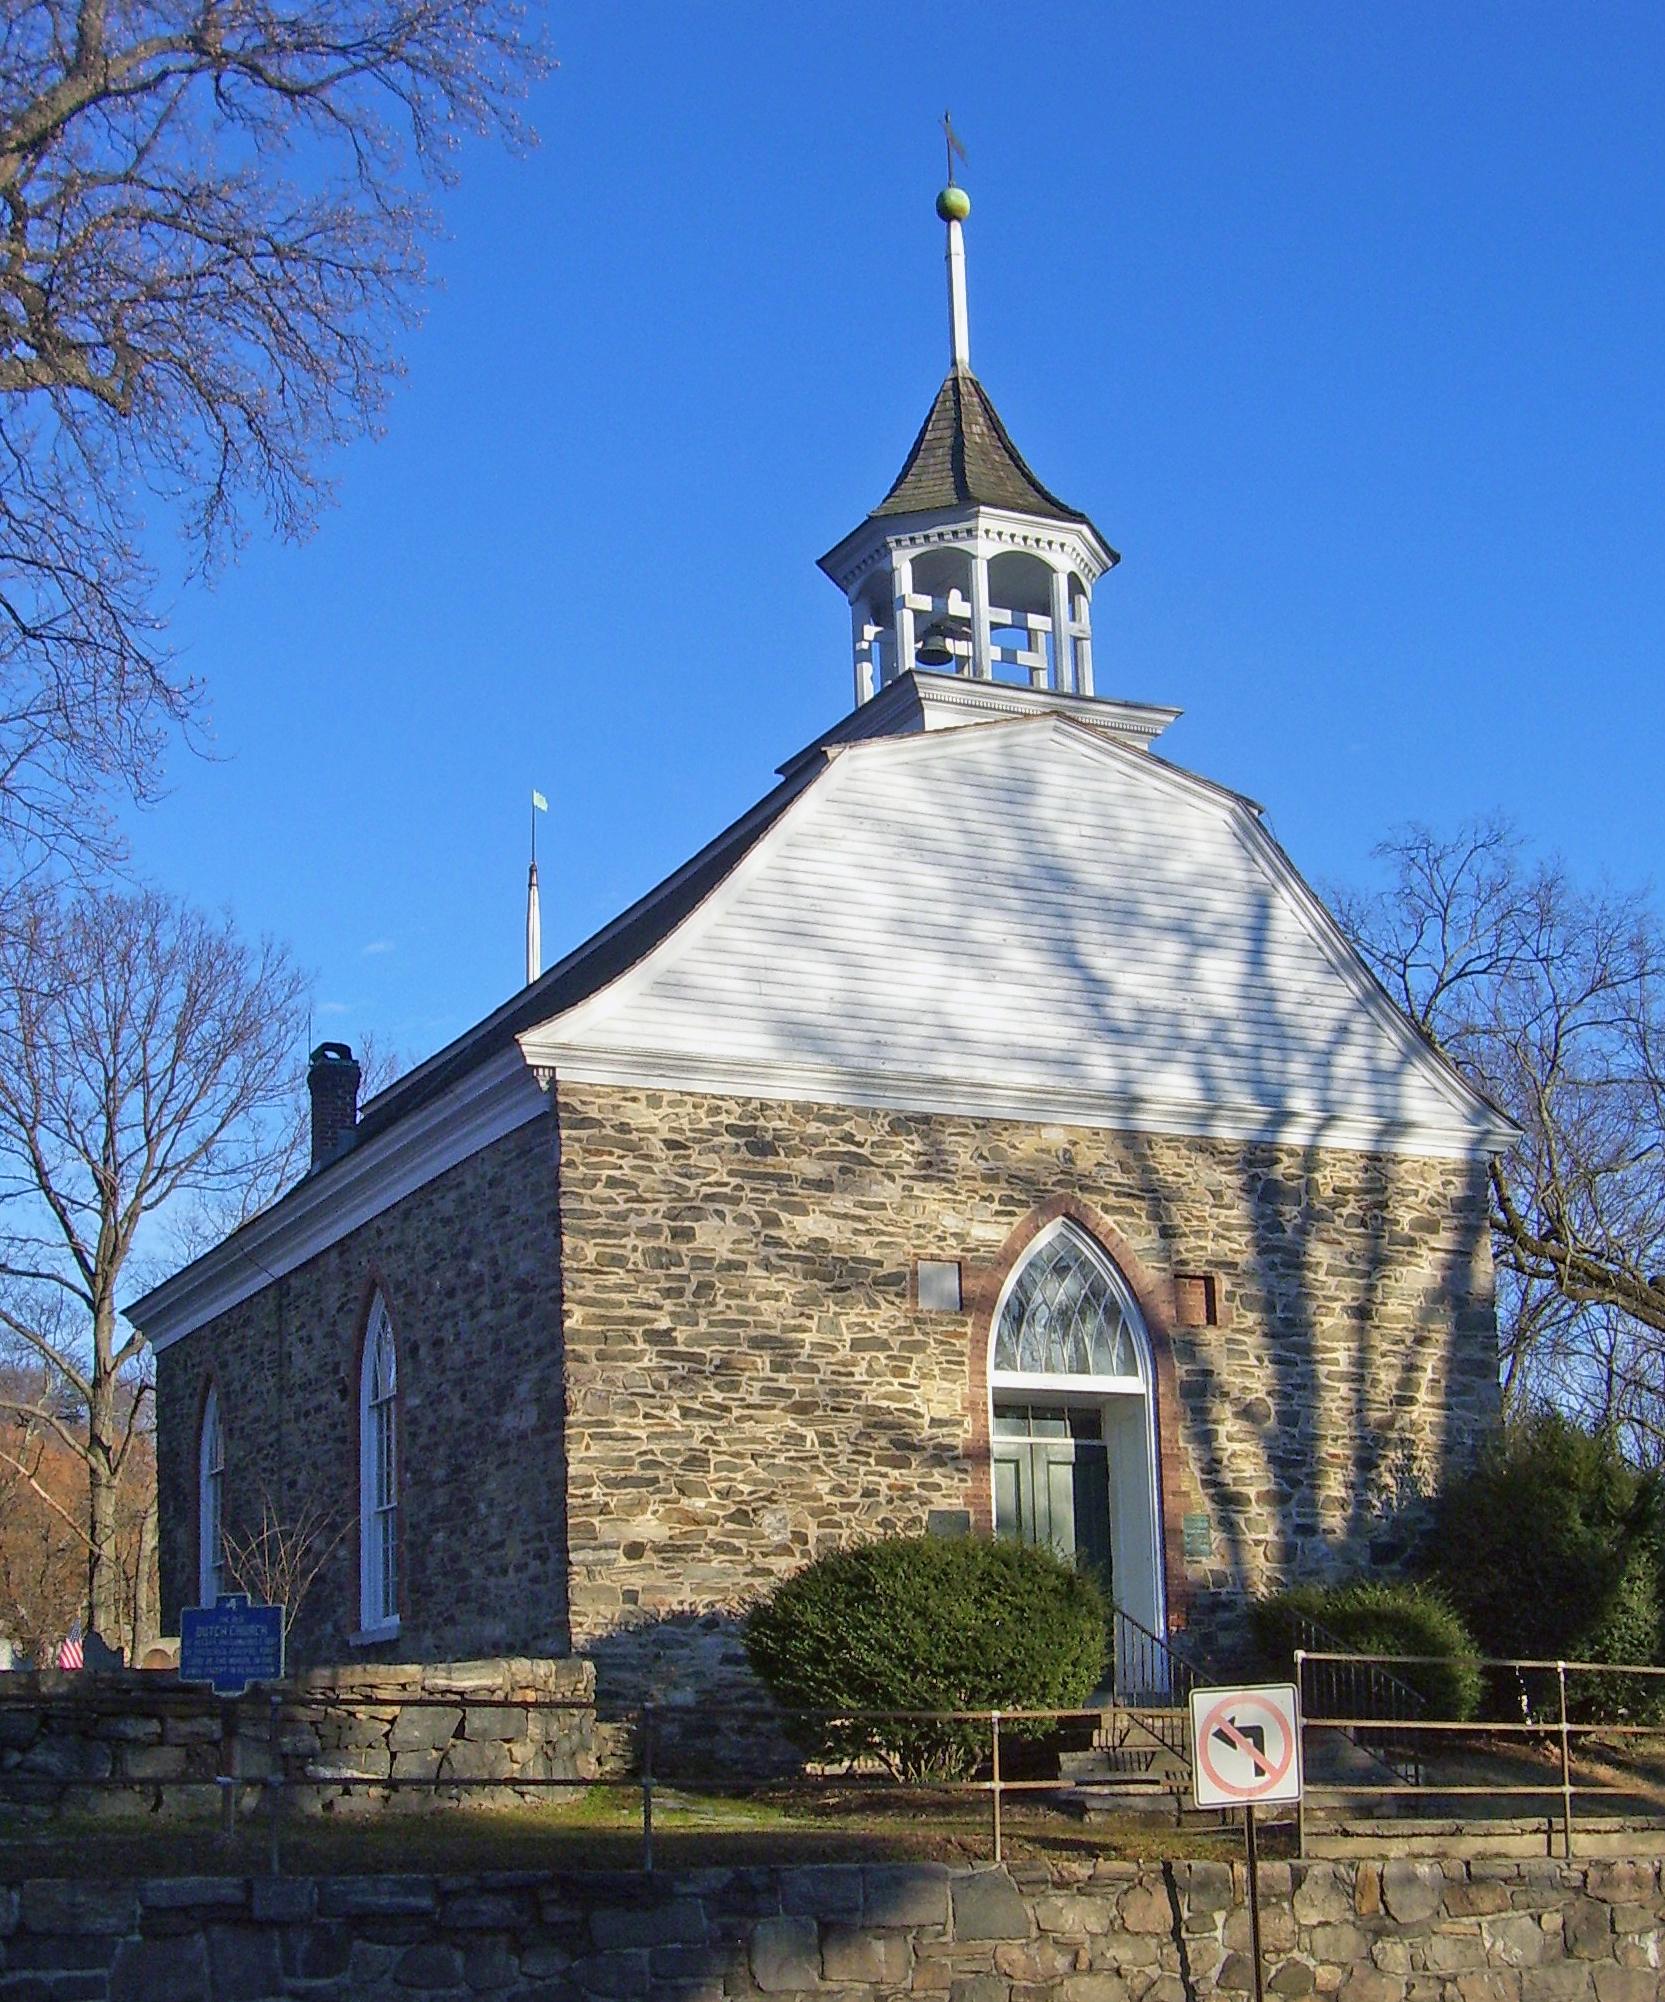 Sleepy Hollow Church near Tarrytown N.Y.